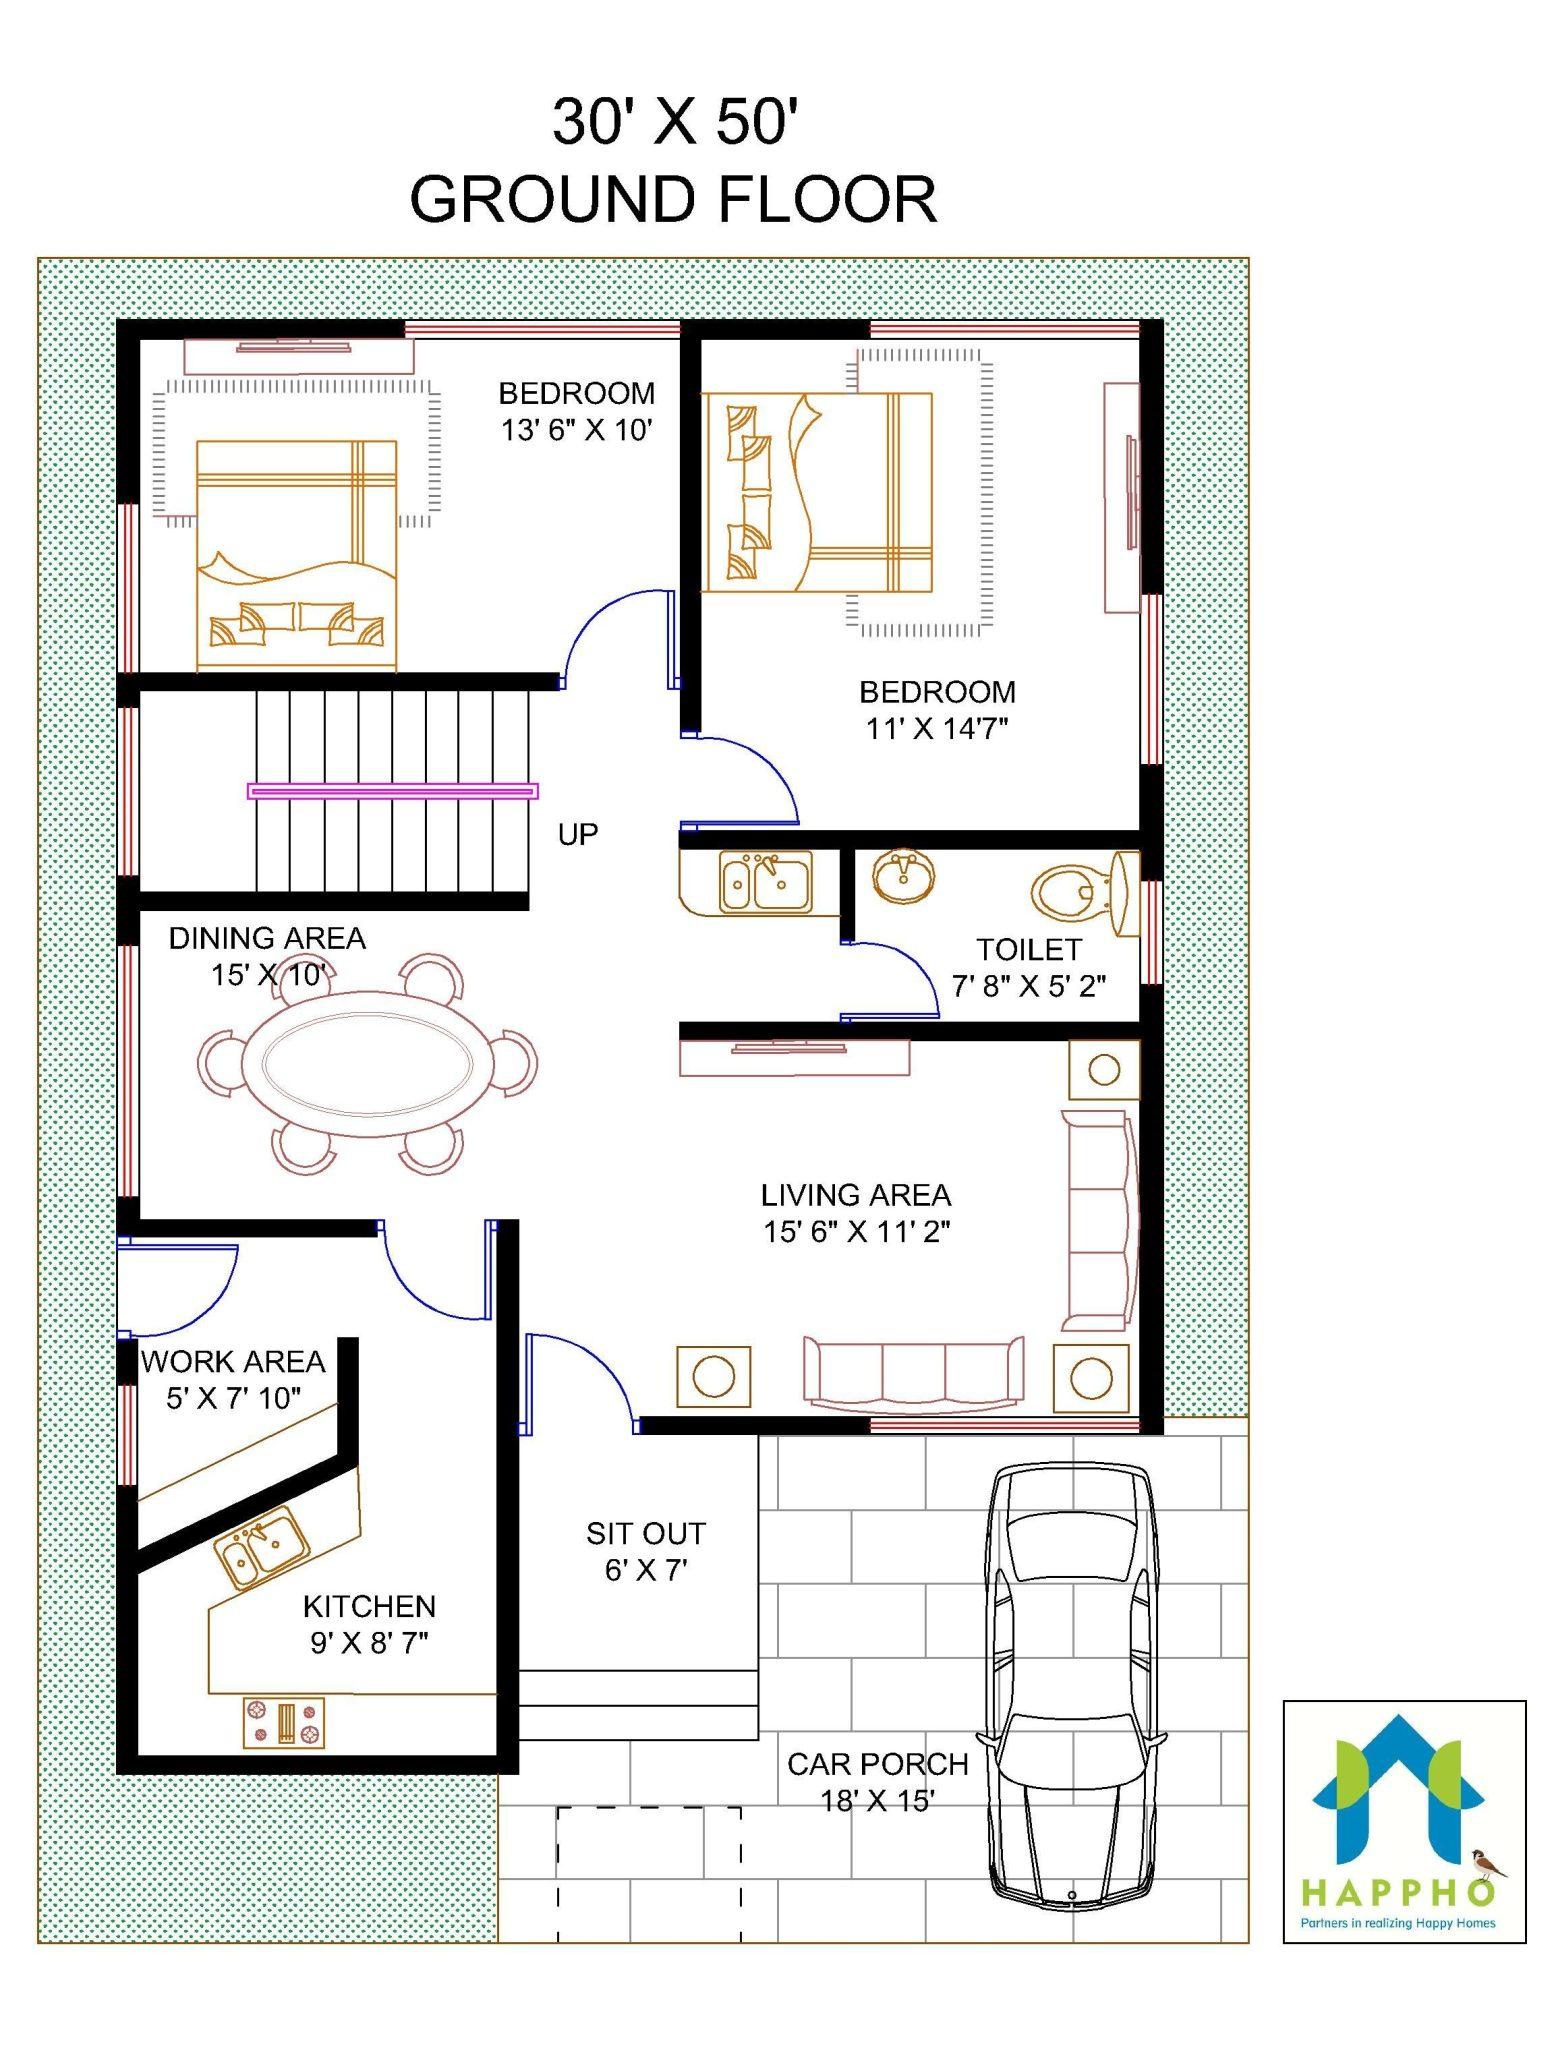 Floor Plan For 30 X 50 Feet Plot 4 BHK1500 Square Feet166 Sq Yards Ghar 035 Happho